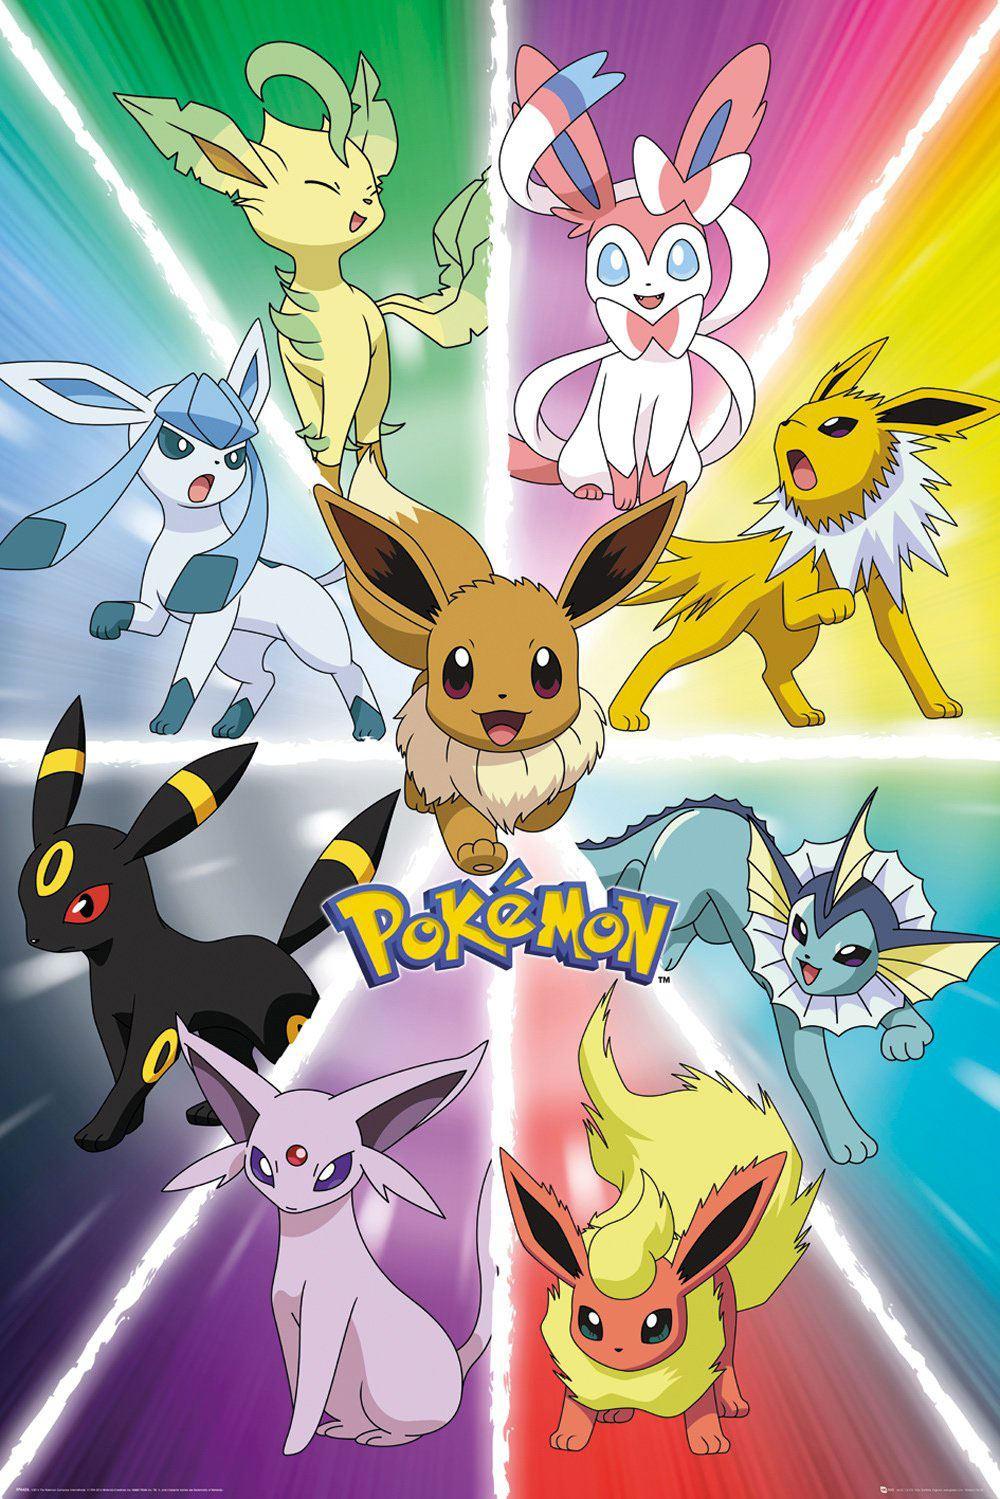 Pokémon Poster Pack Eevee Evolution 61 x 91 cm (5)